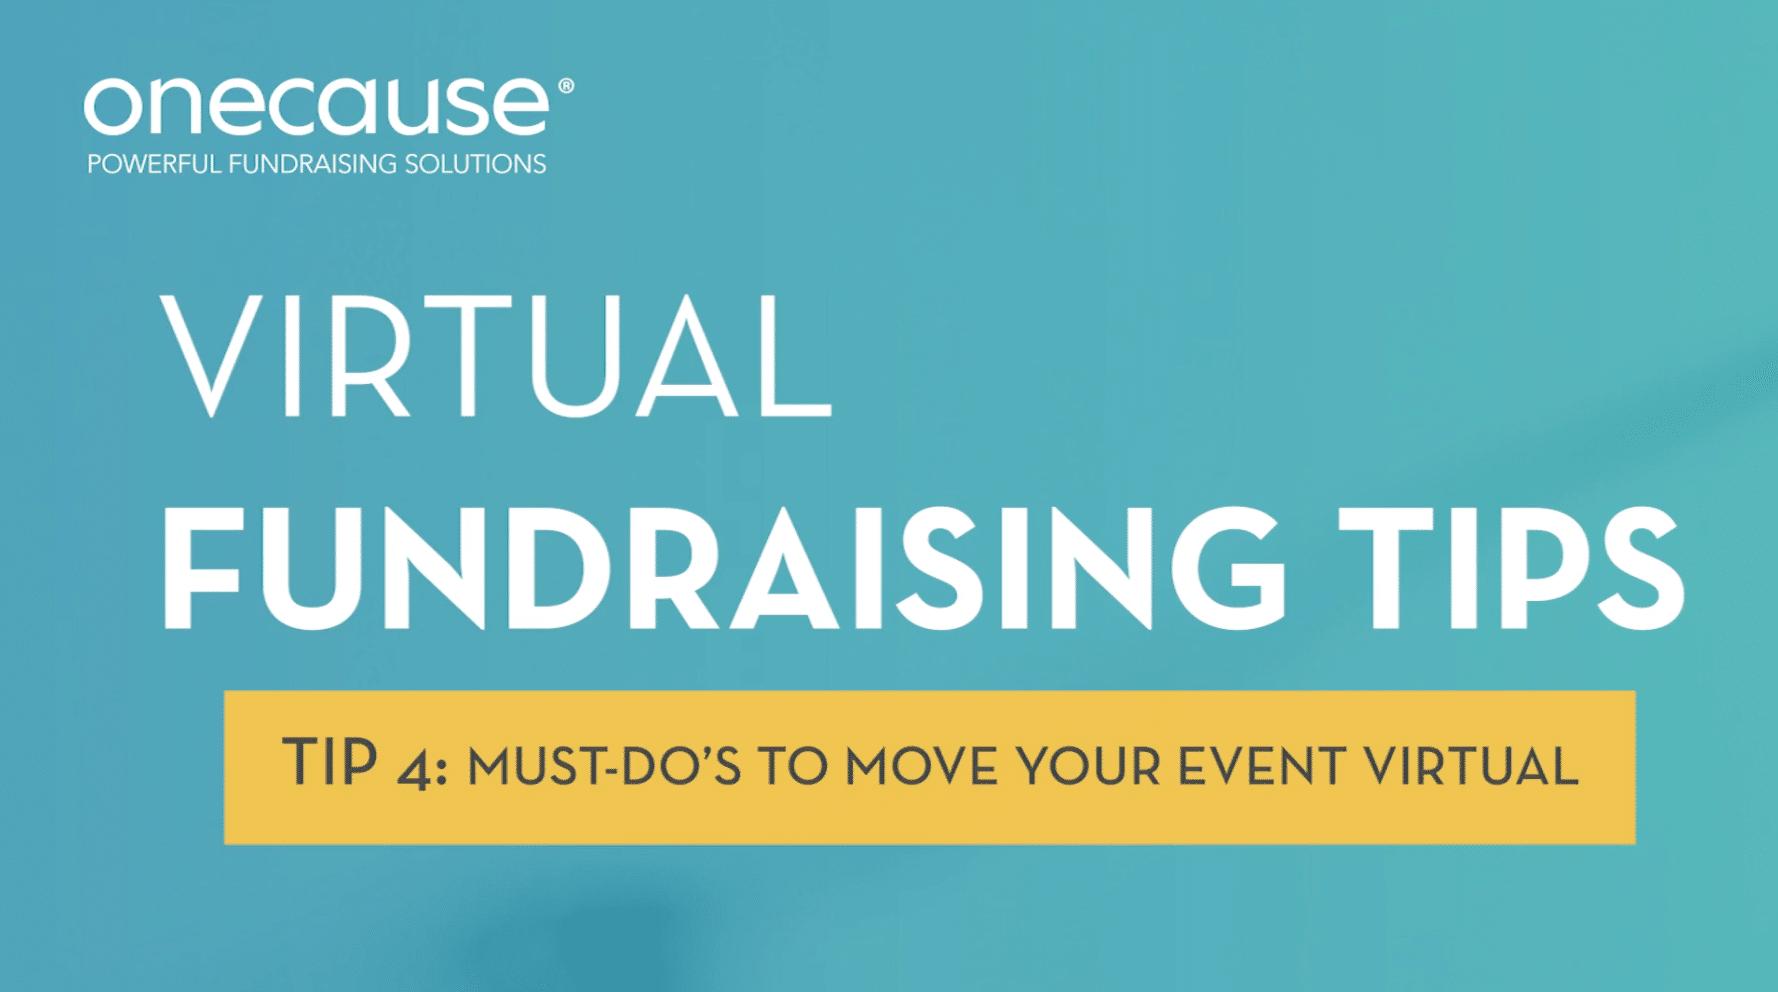 Virtual Fundraising Tip 4 Video